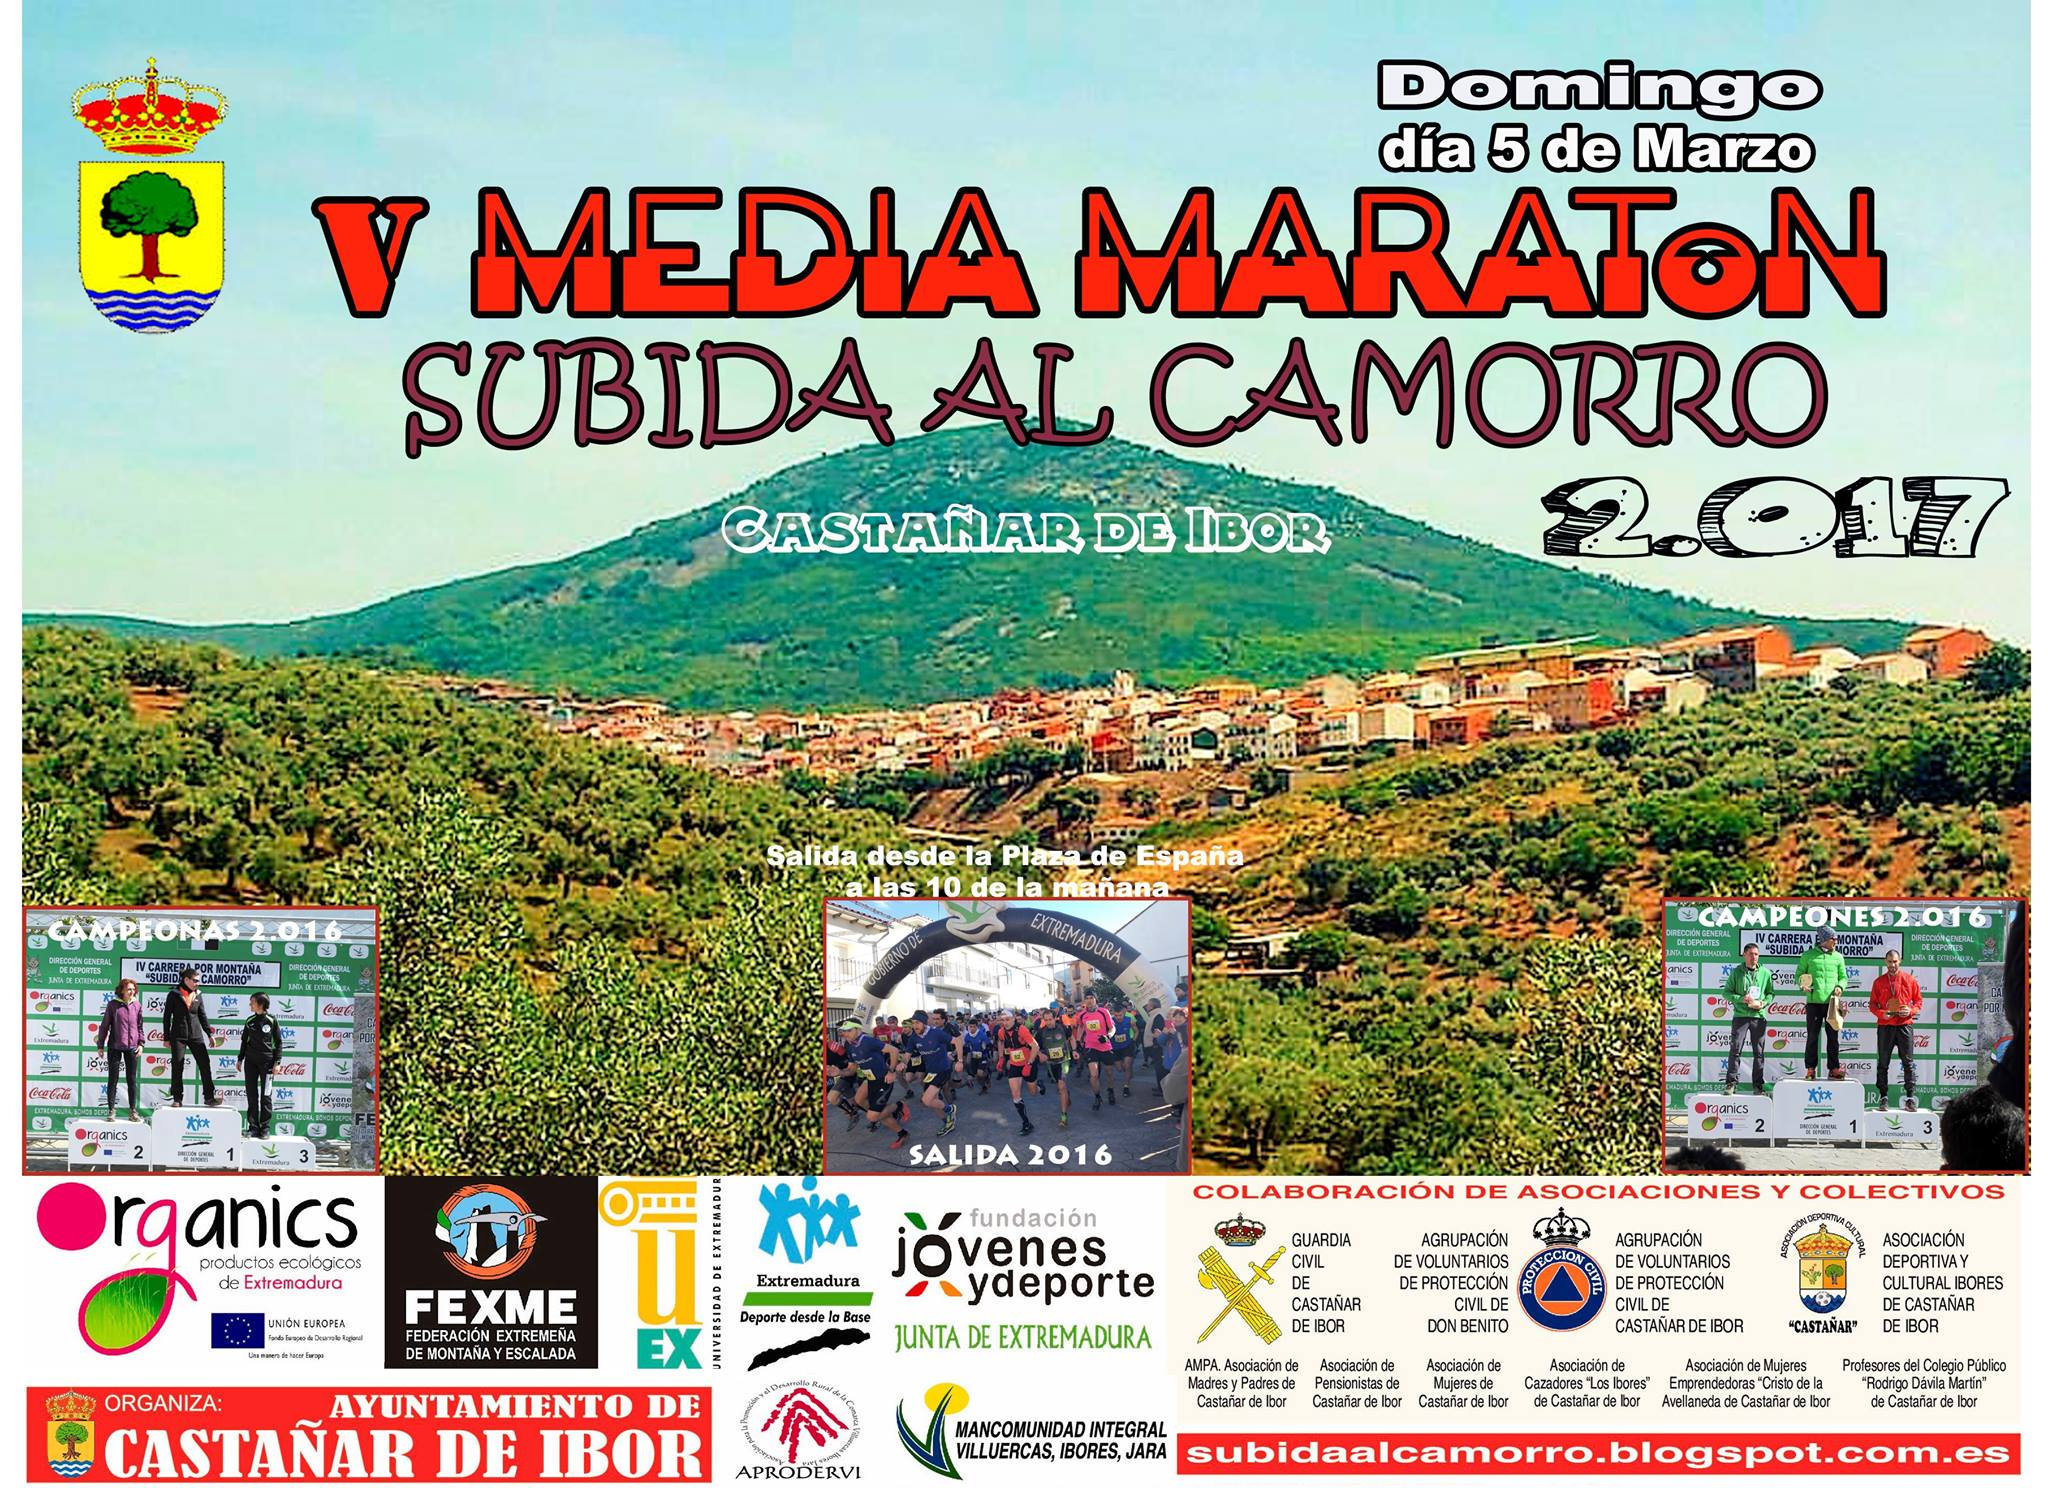 V Media maratón - Castañar de Ibor